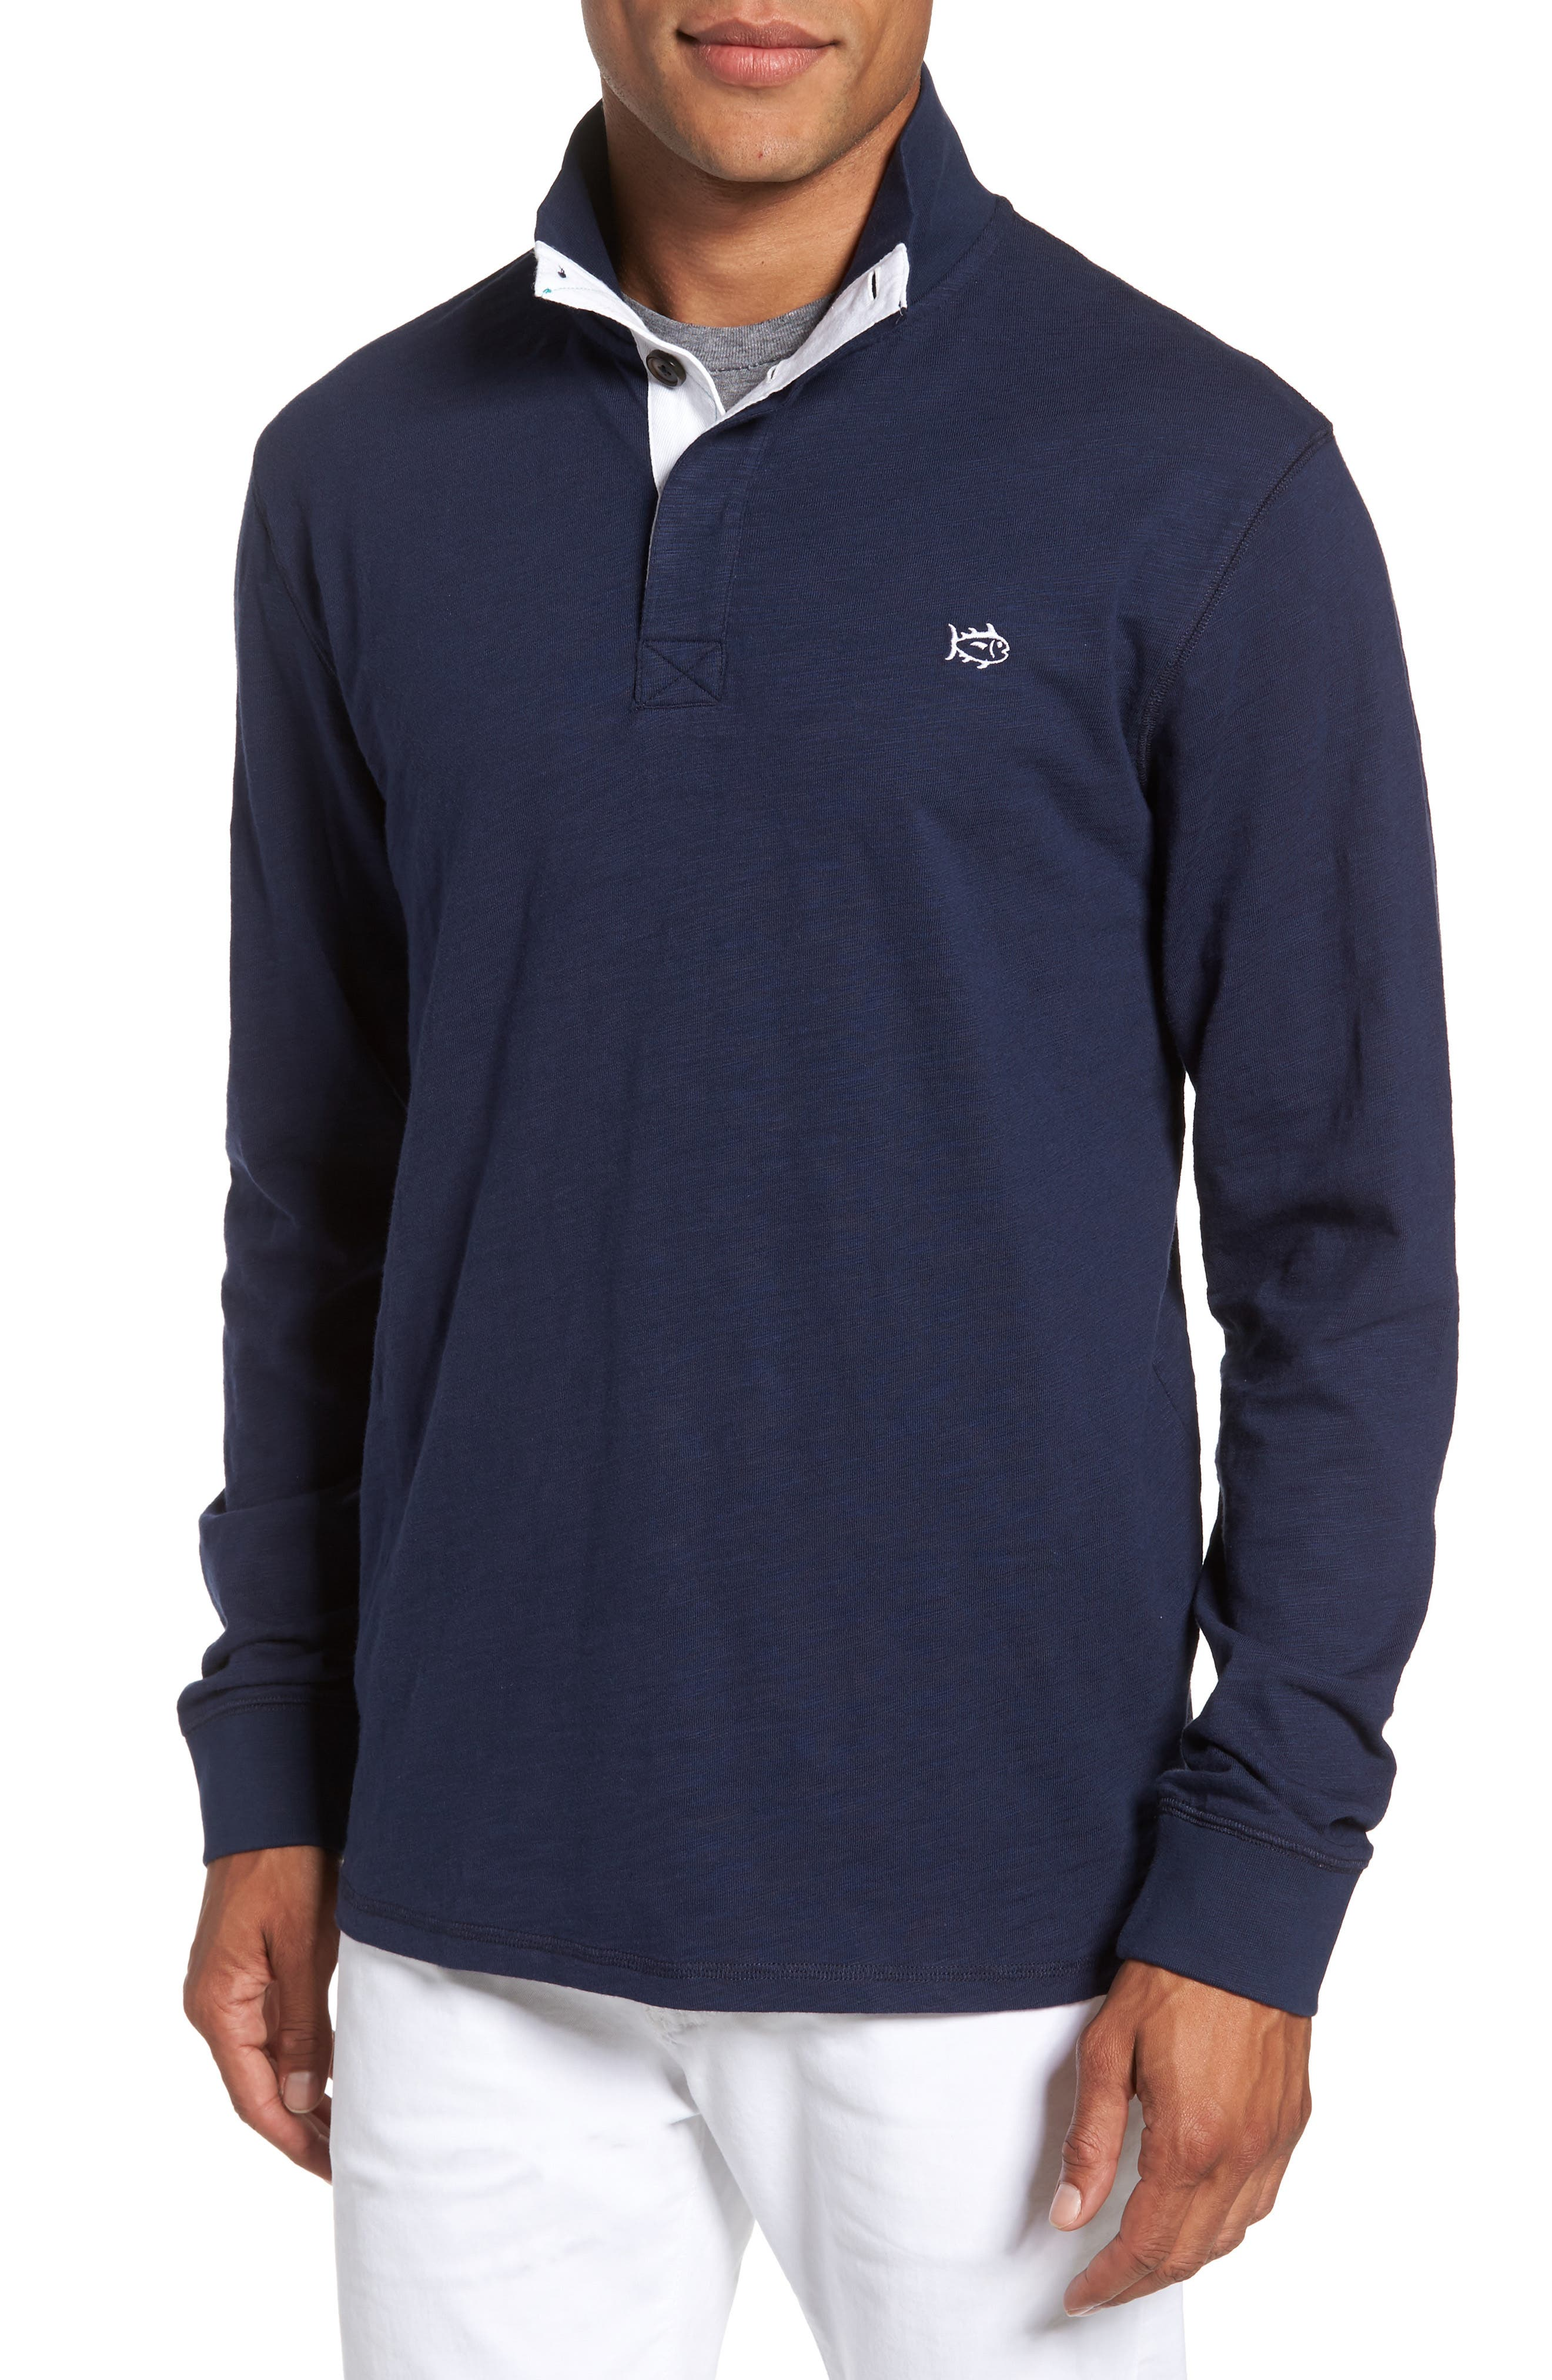 SOUTHERN TIDE Gulf Stream Sweatshirt